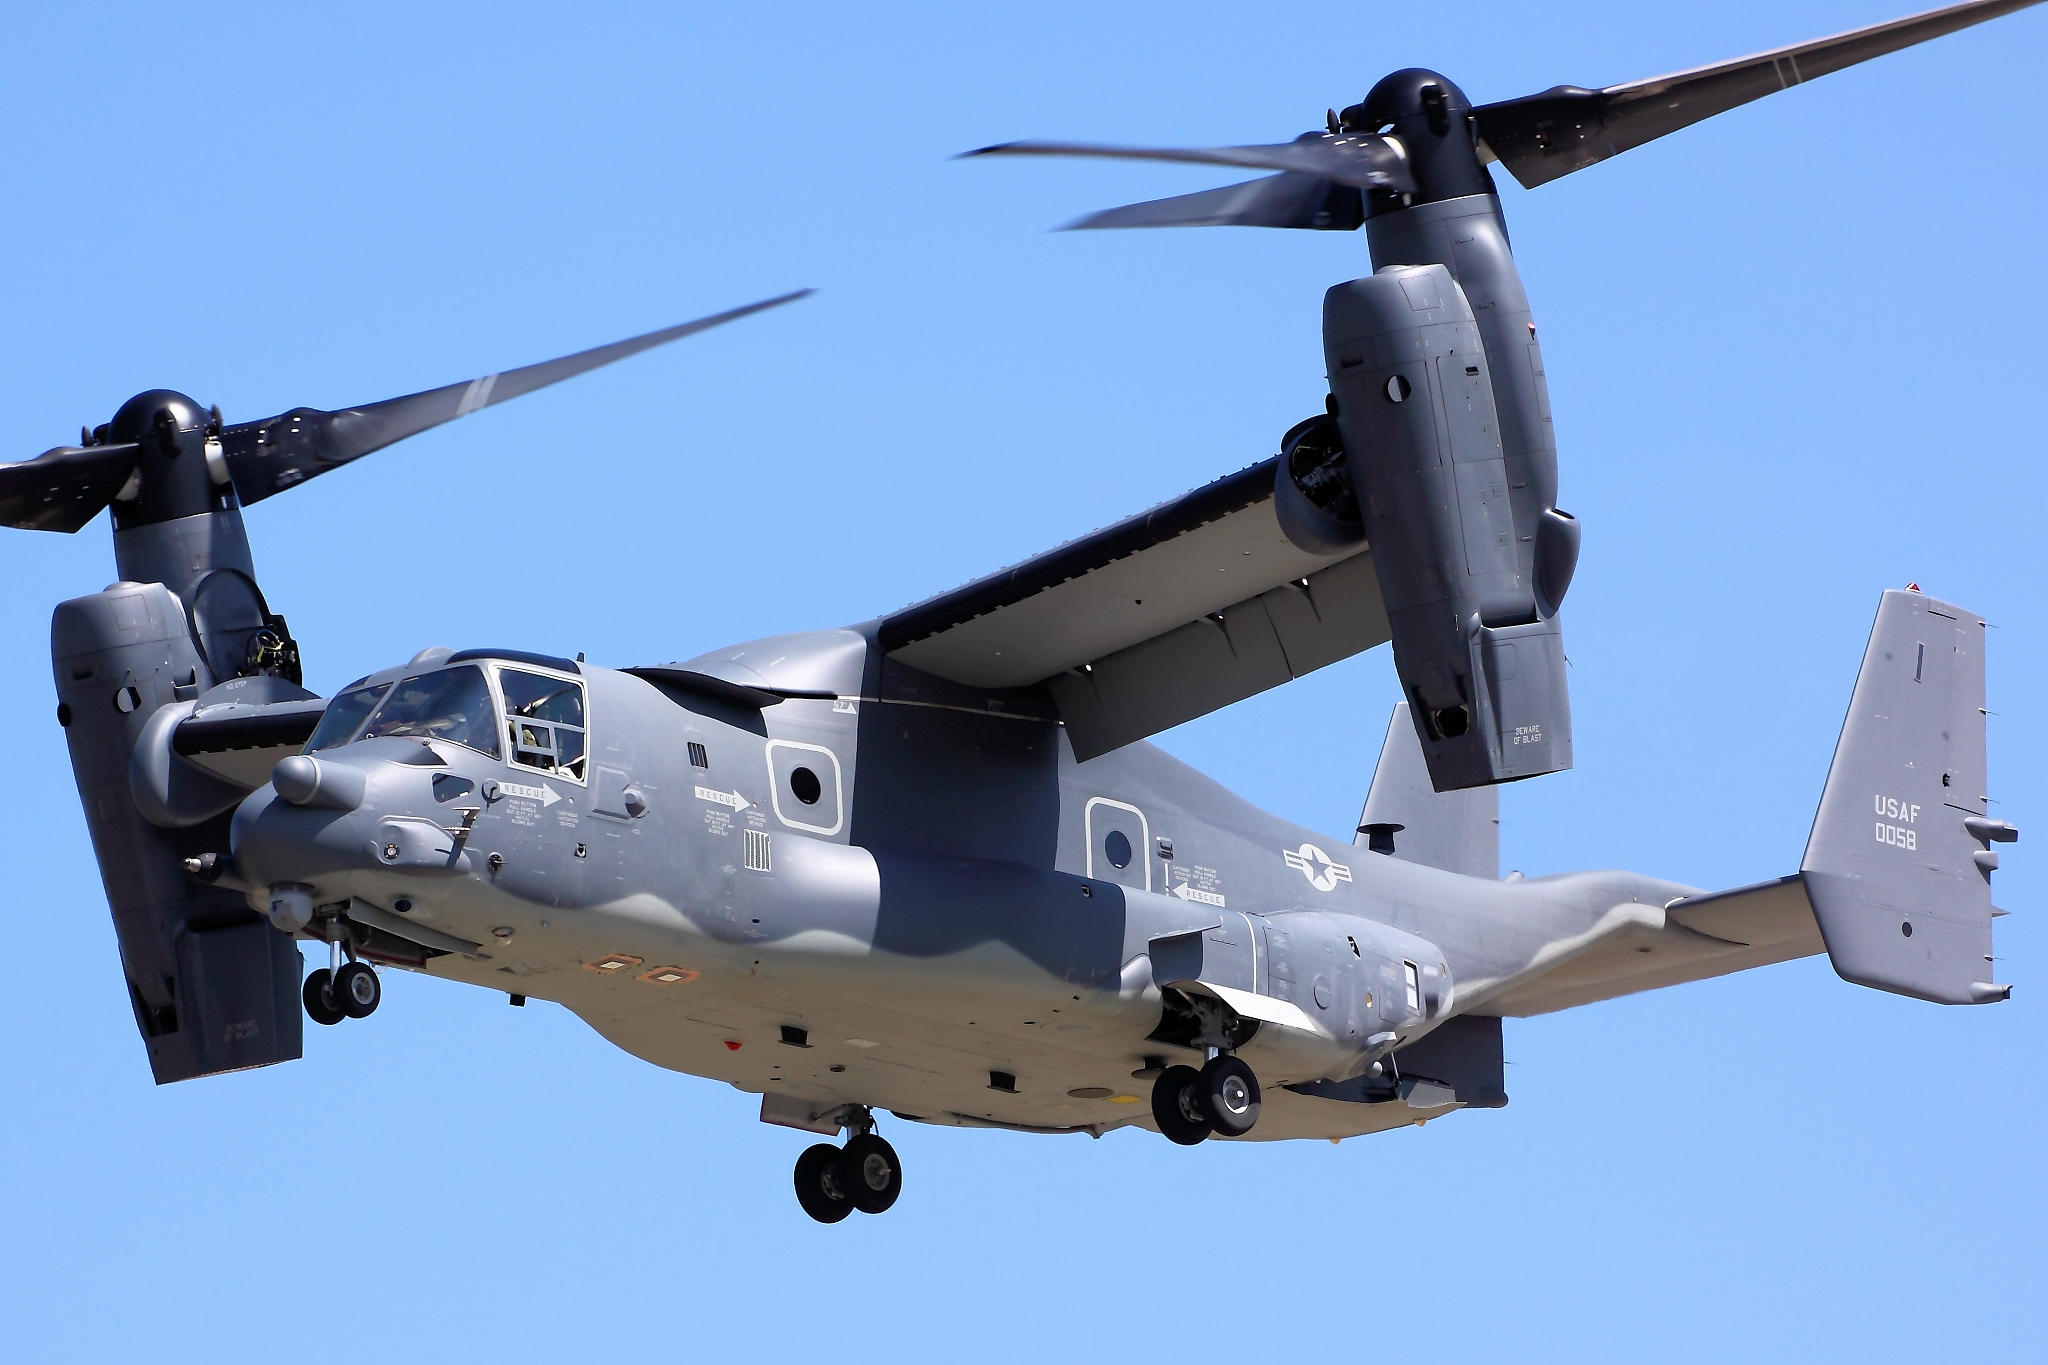 Elicottero Osprey : V osprey military helicopter cargo transport plane h